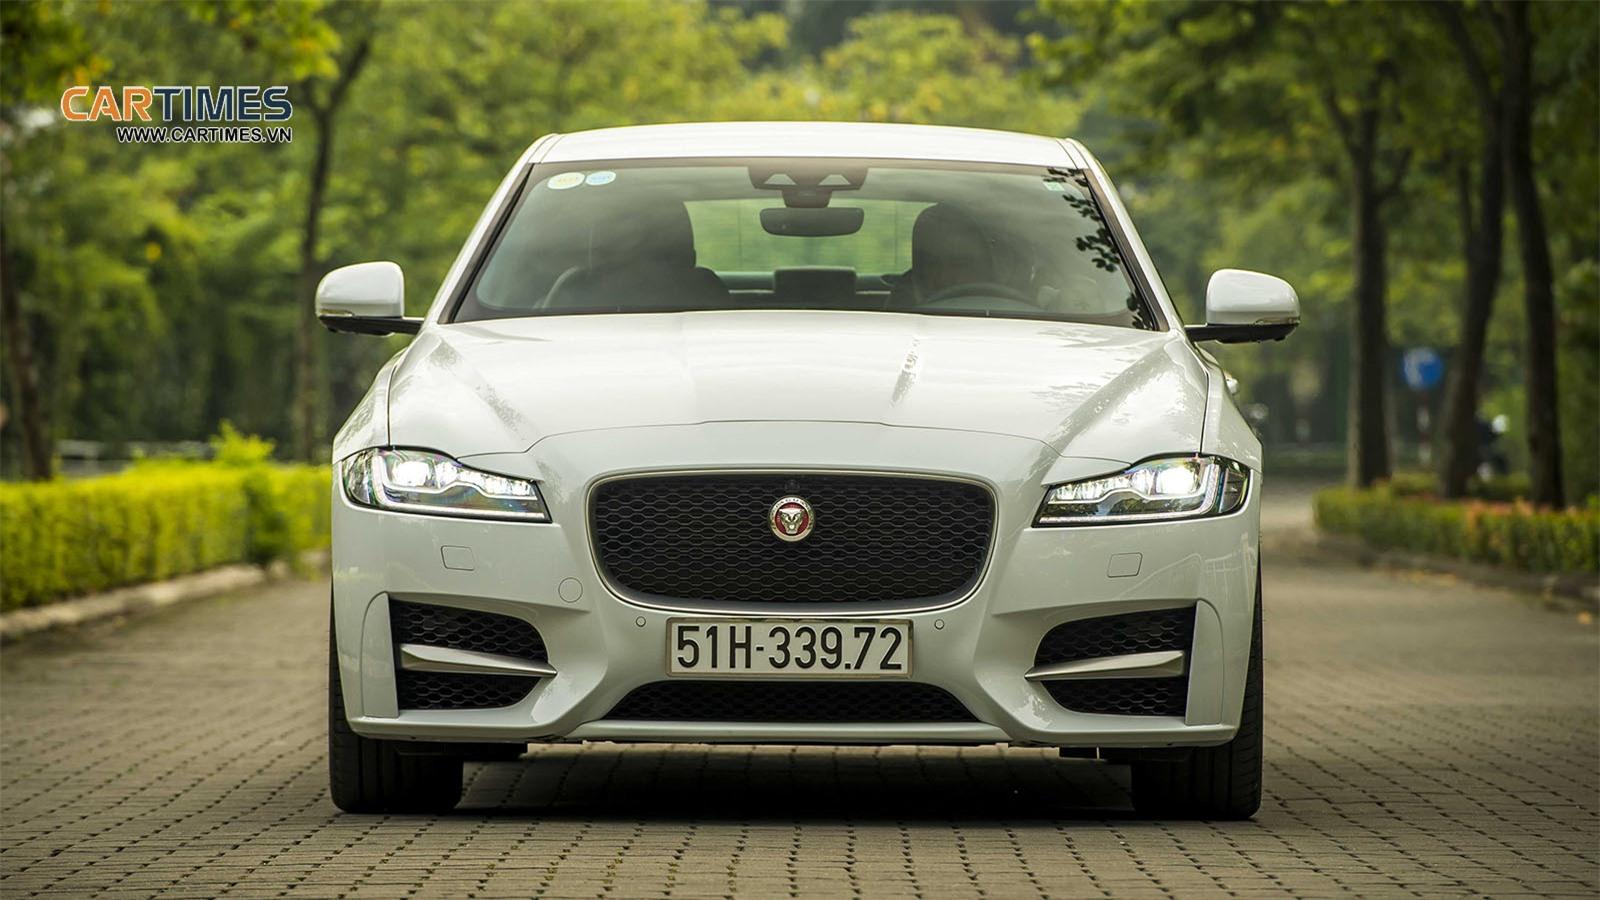 Đầu xe Jaguar XF